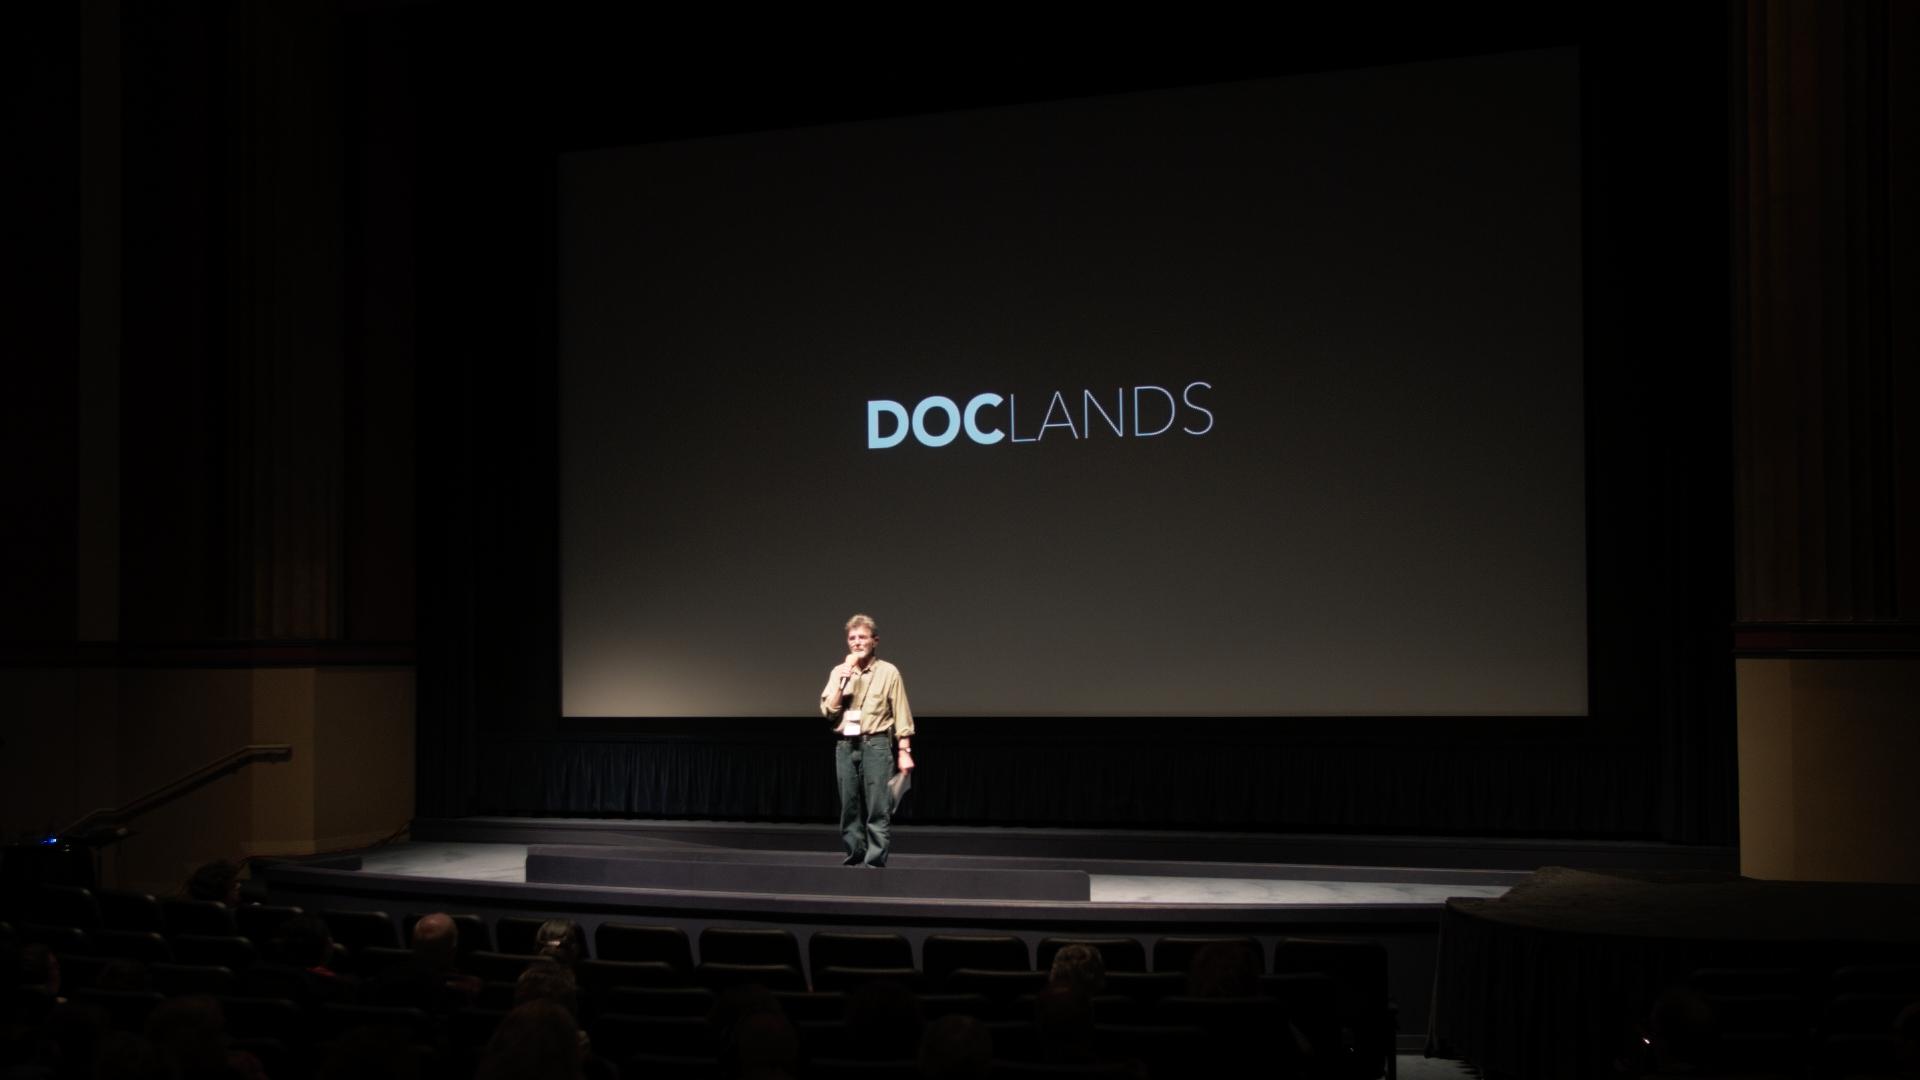 DocLands_Dailies_Day02_I.2.1.jpg